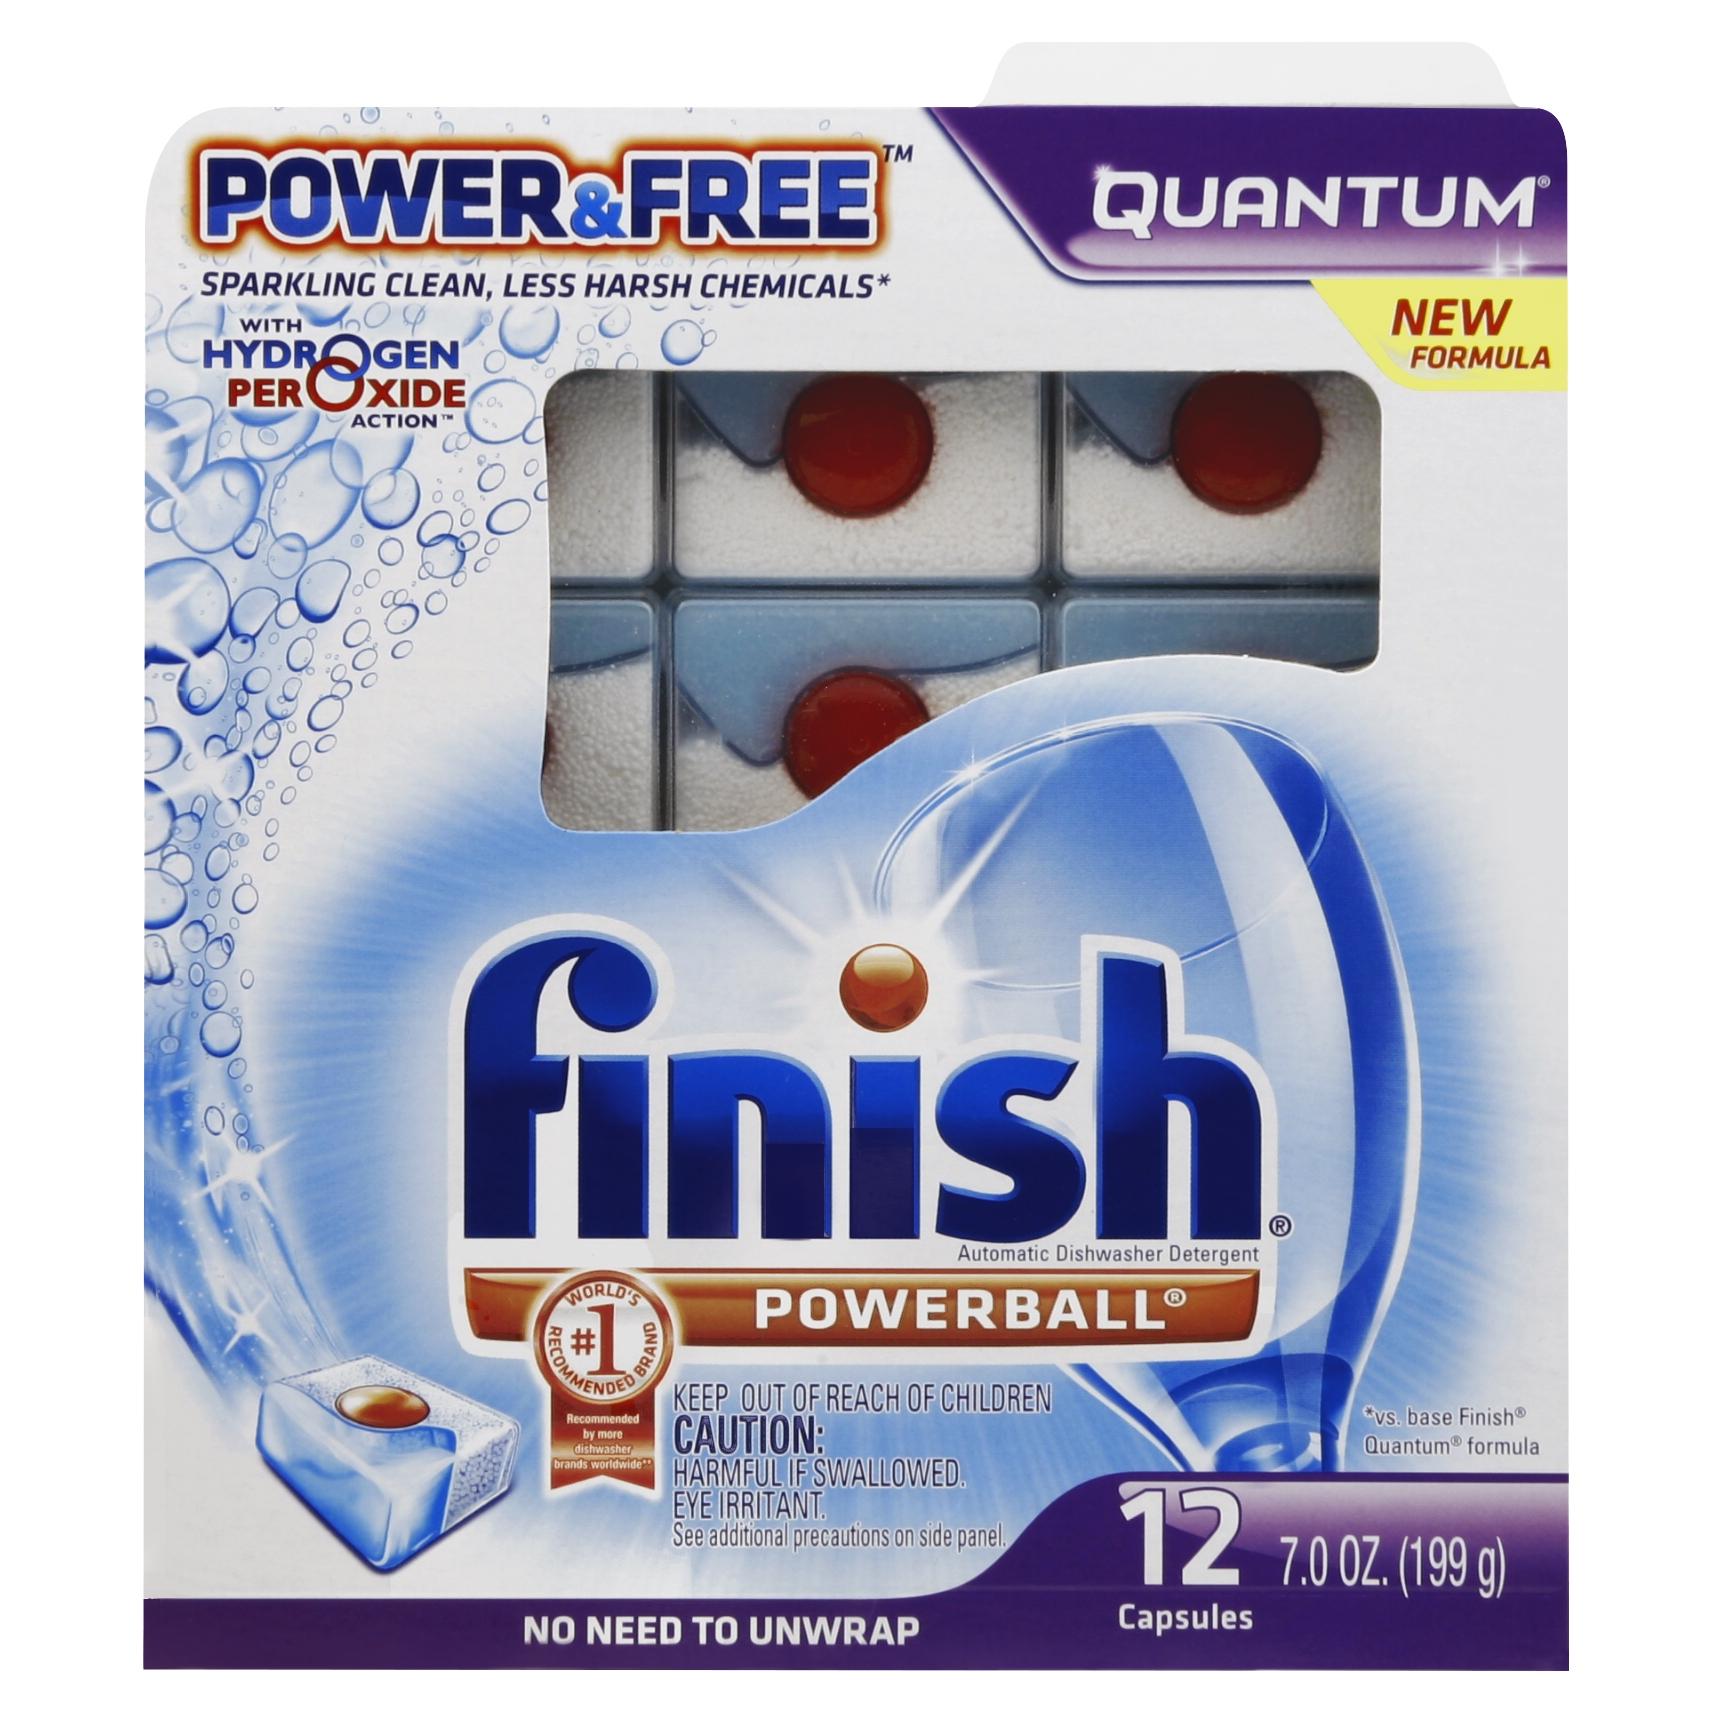 Finish Quantum Dishwasher Detergent, Power & Free, 12 Count